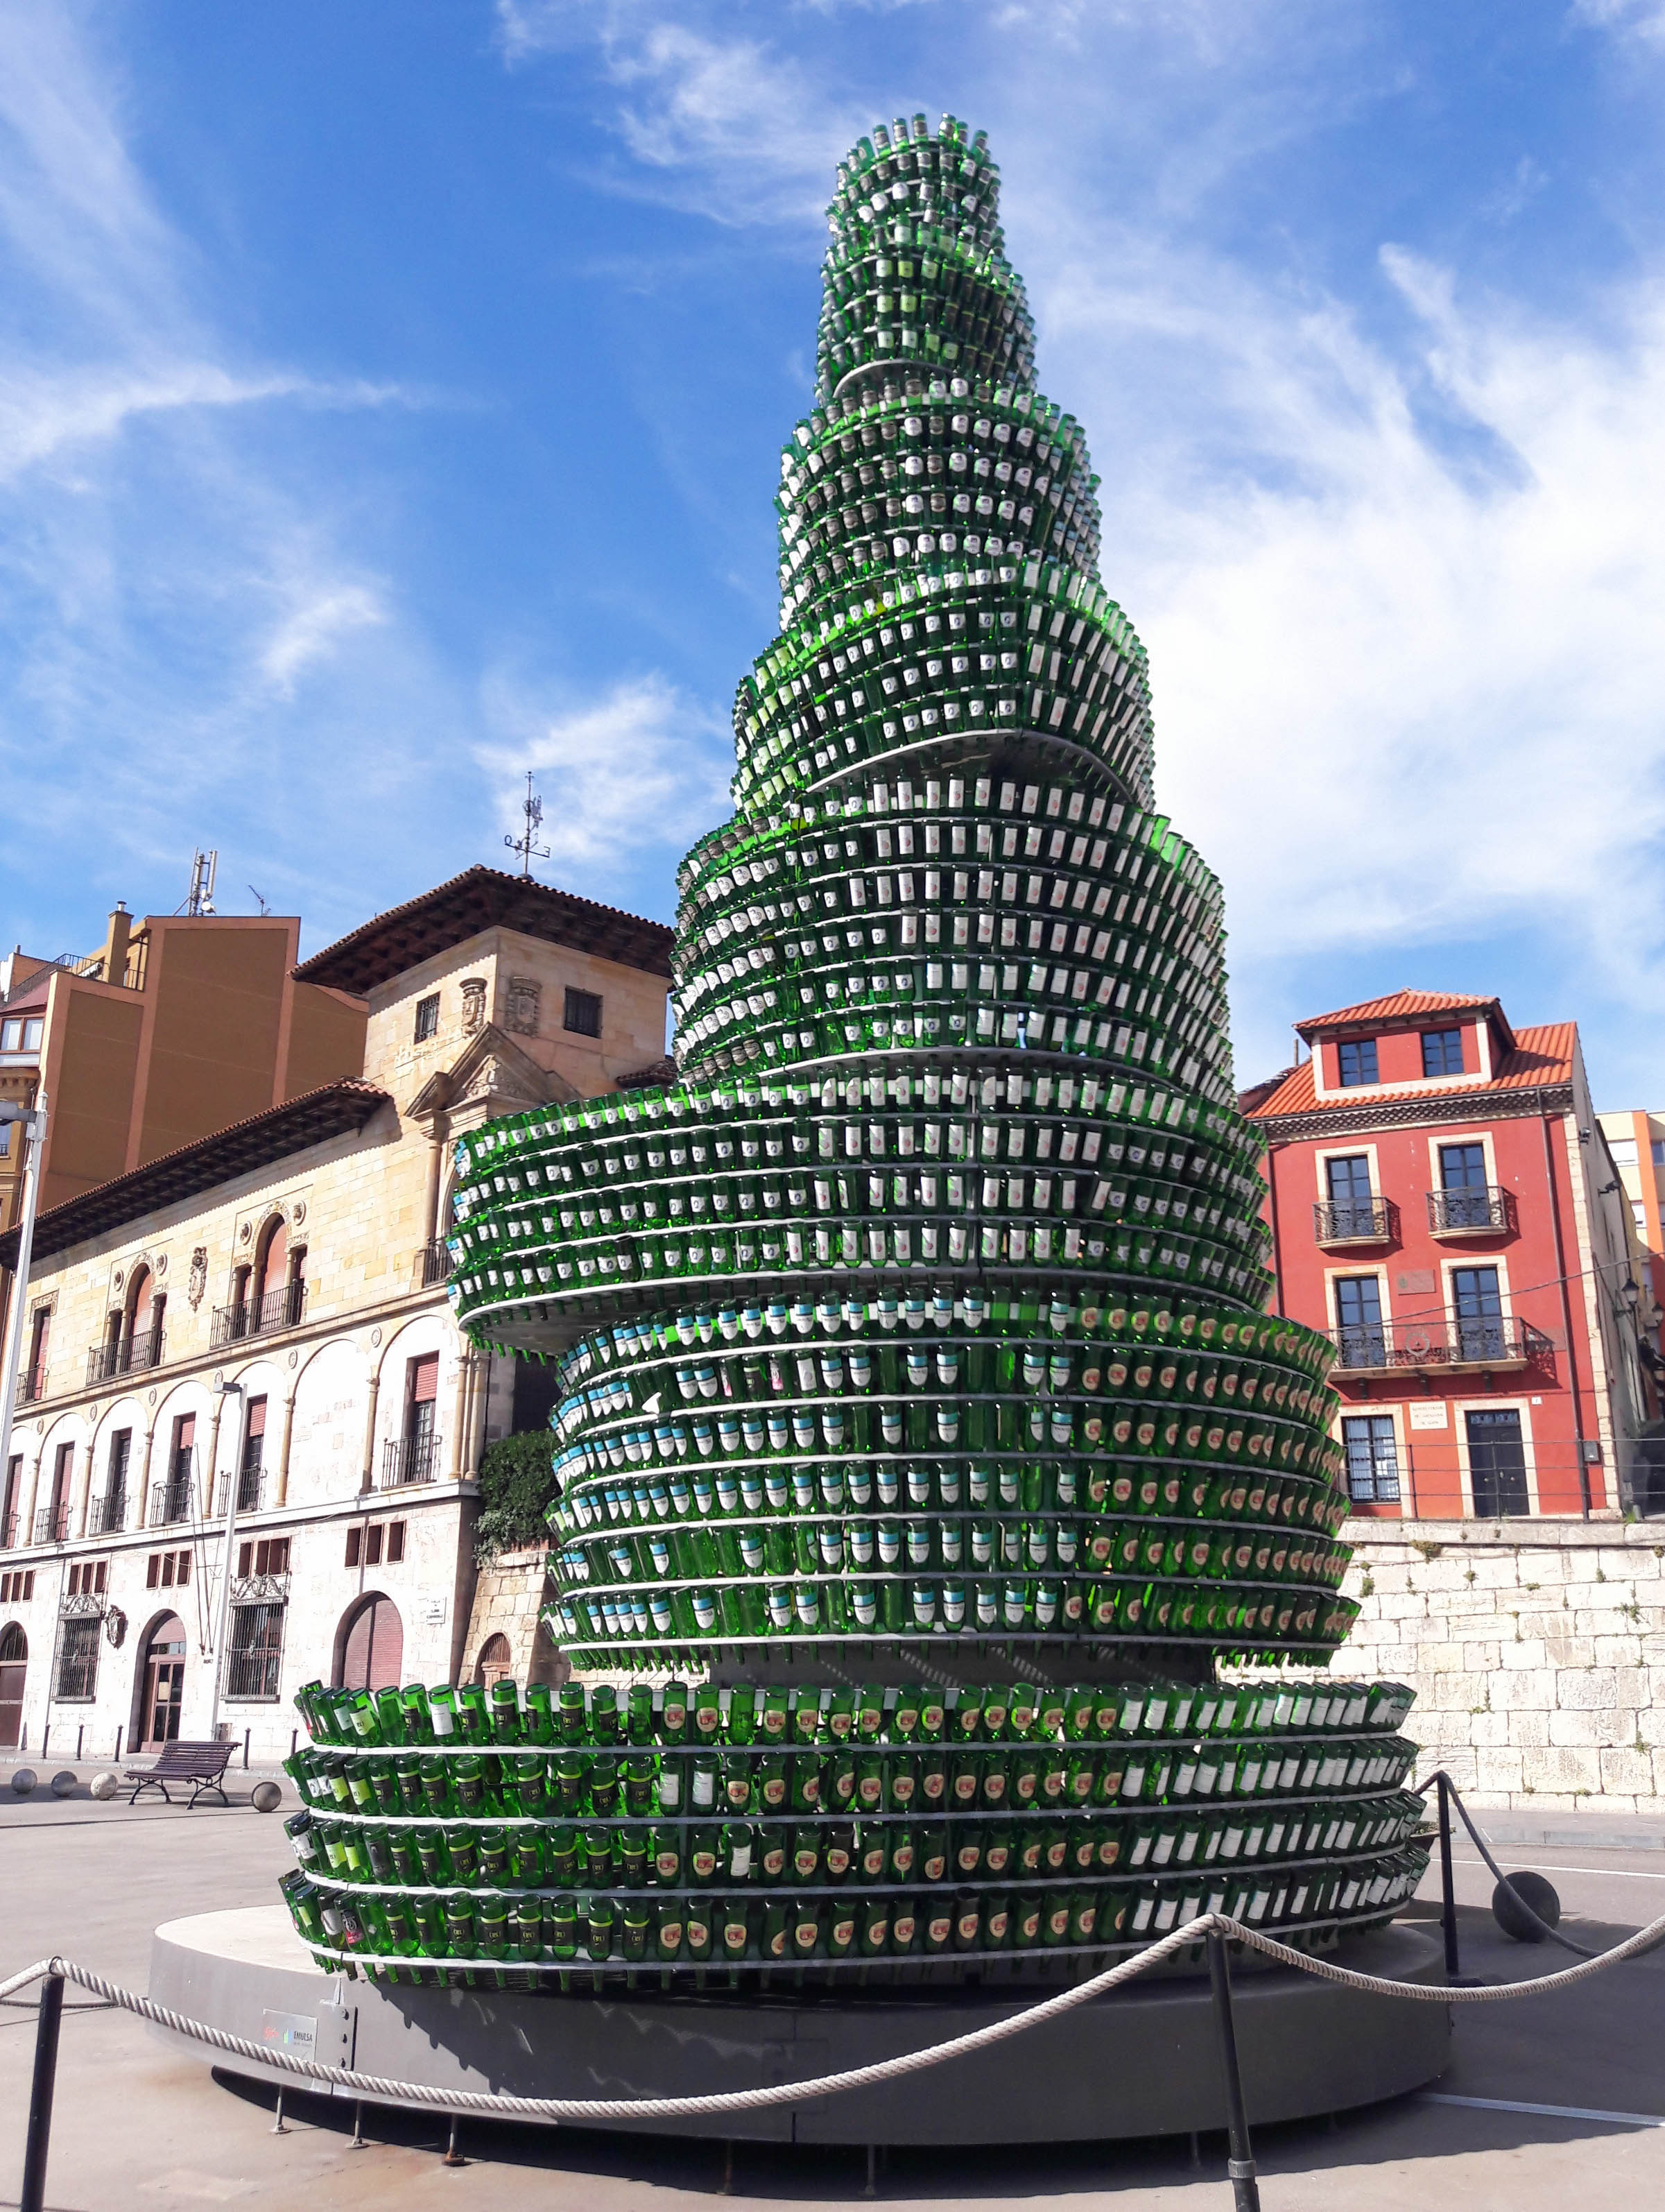 Bottle tree, Gijón, Asturias